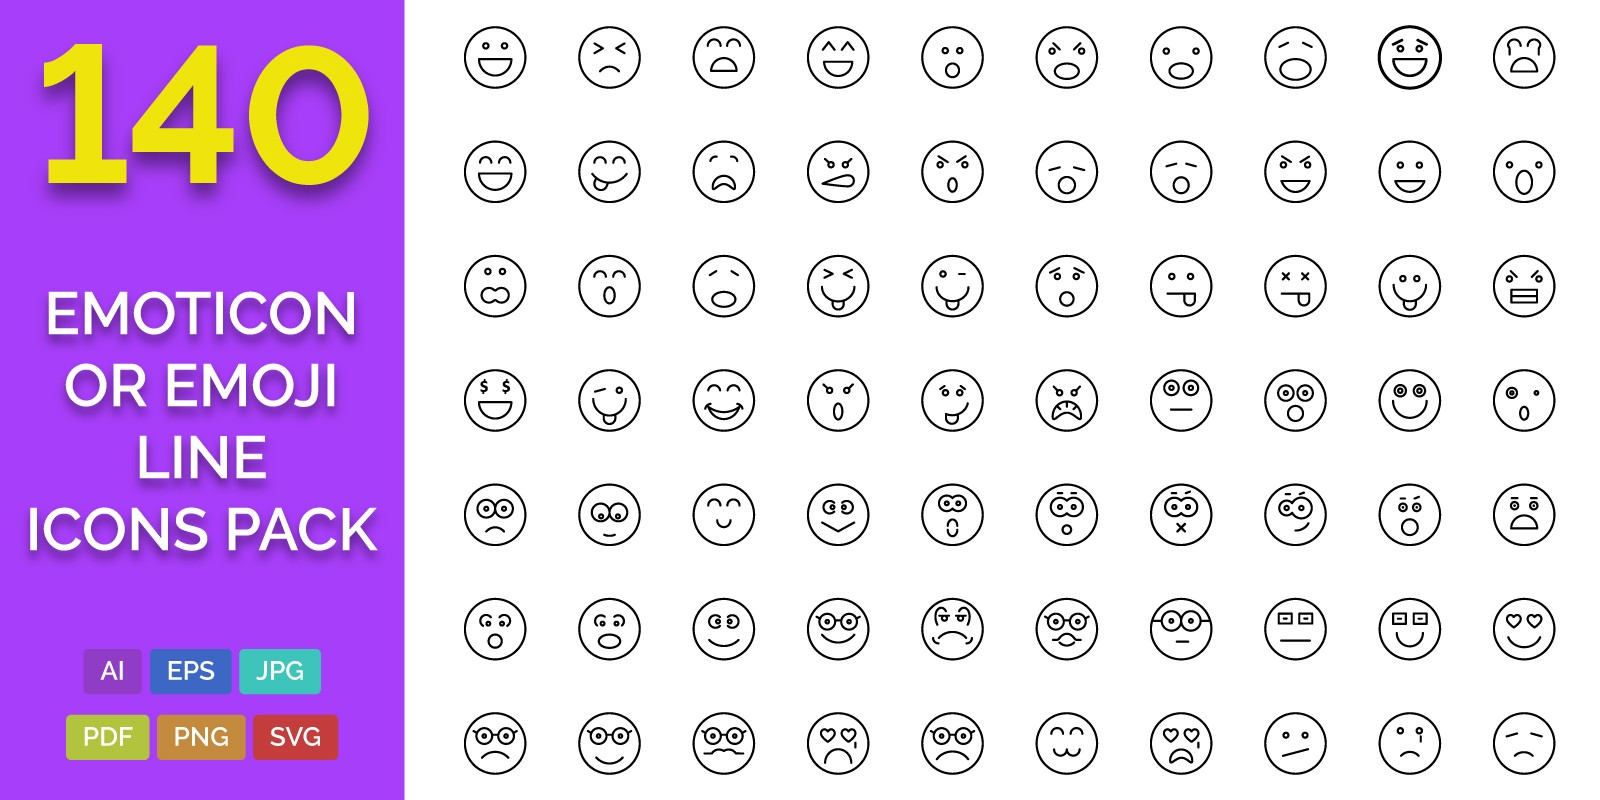 140 Emoticon or Emoji Line Icons Pack